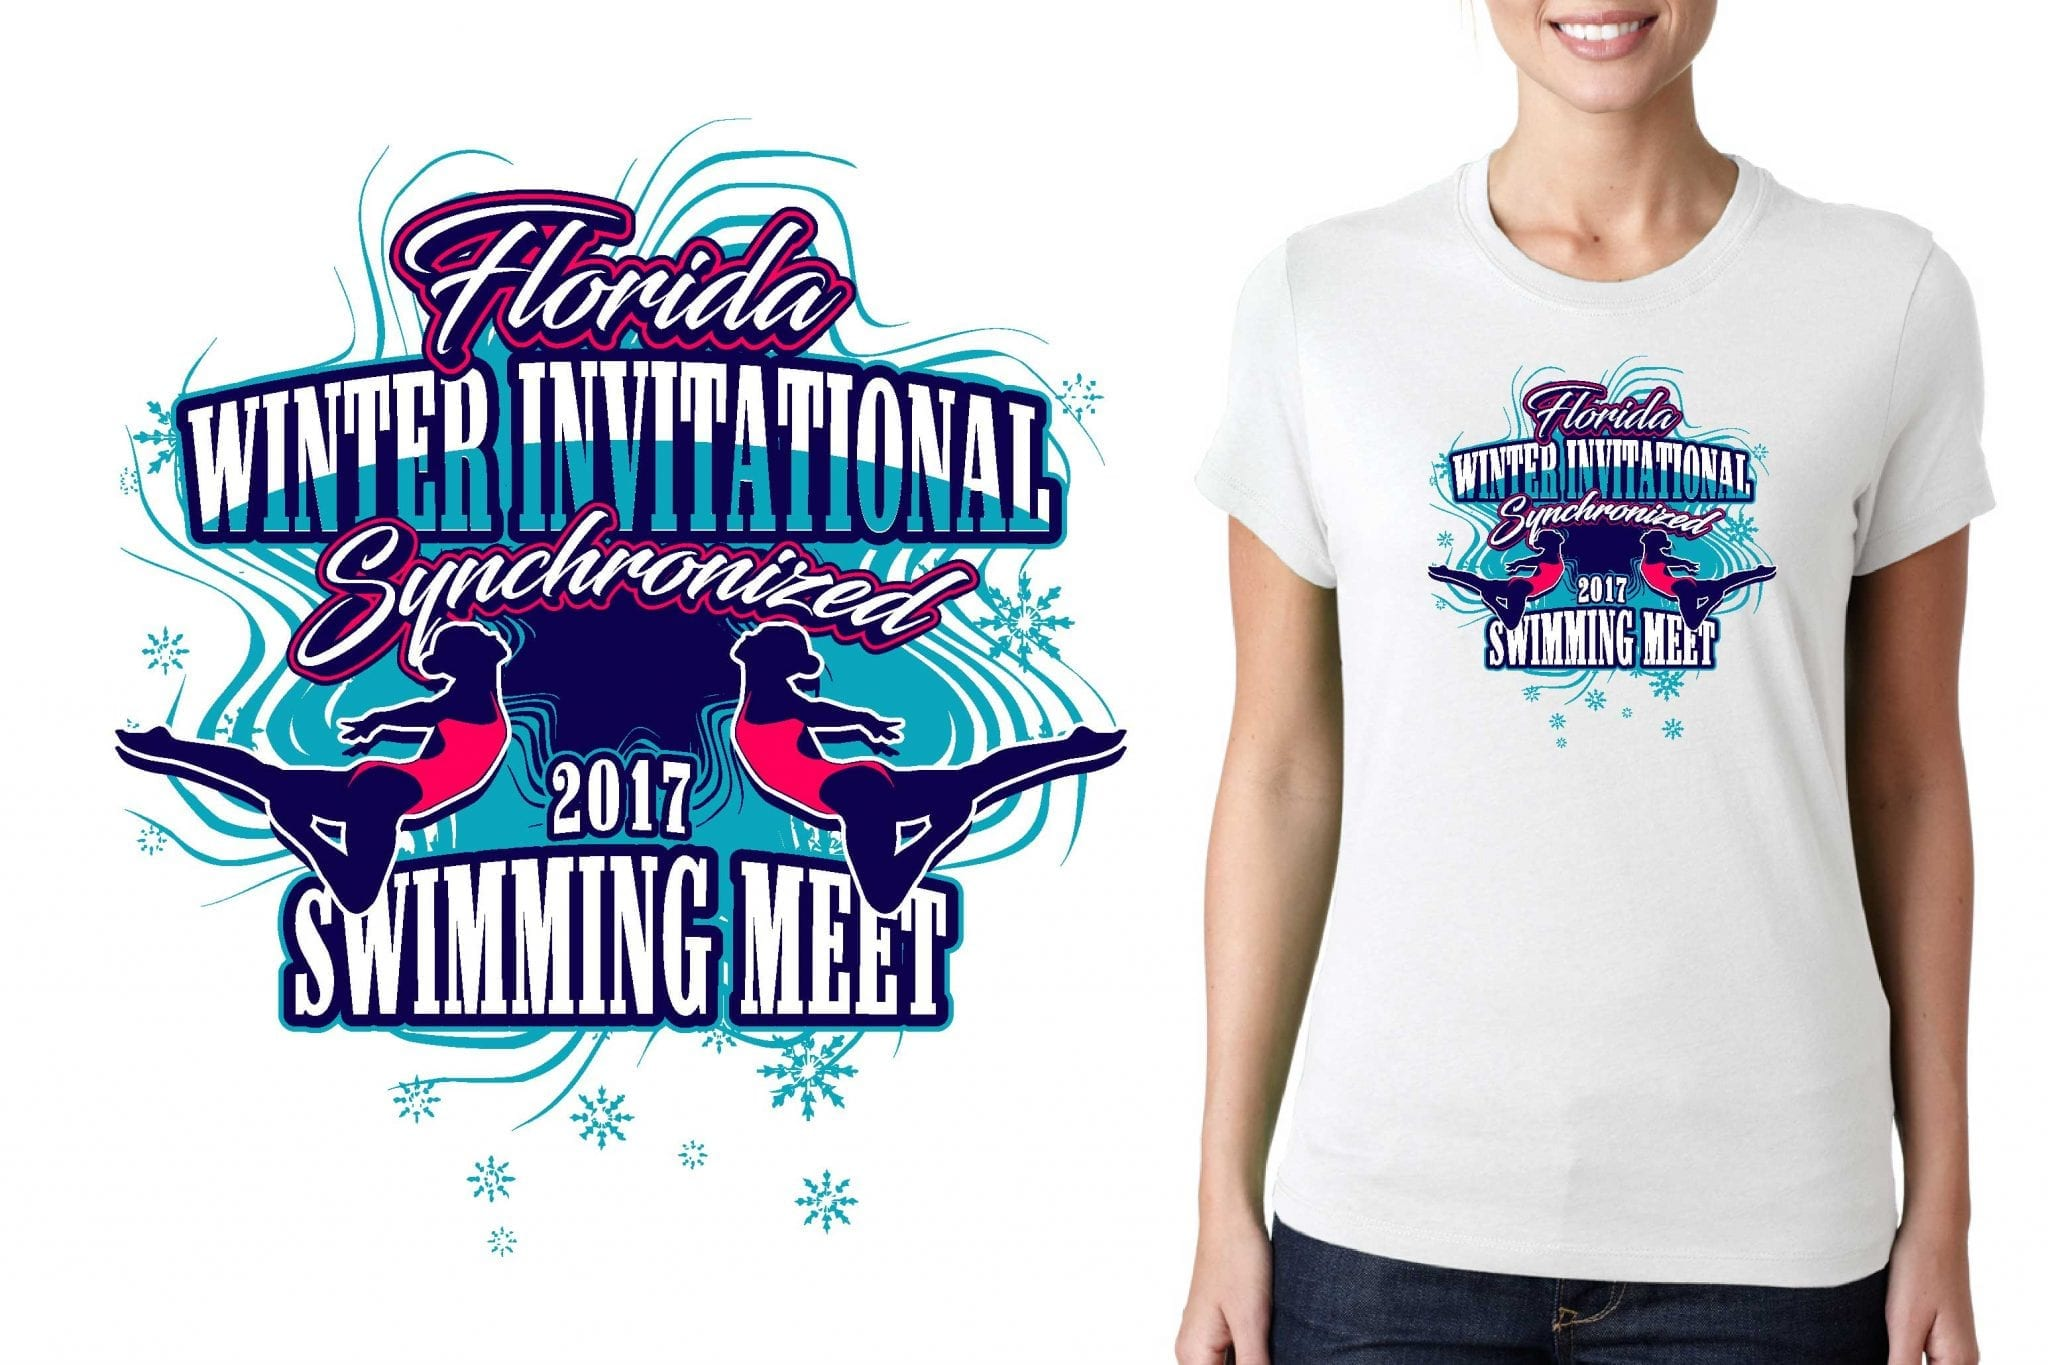 LOGO for Florida-Winter-Invitational-Synchronized-Swimming-Meet T-SHIRT UrArtStudio